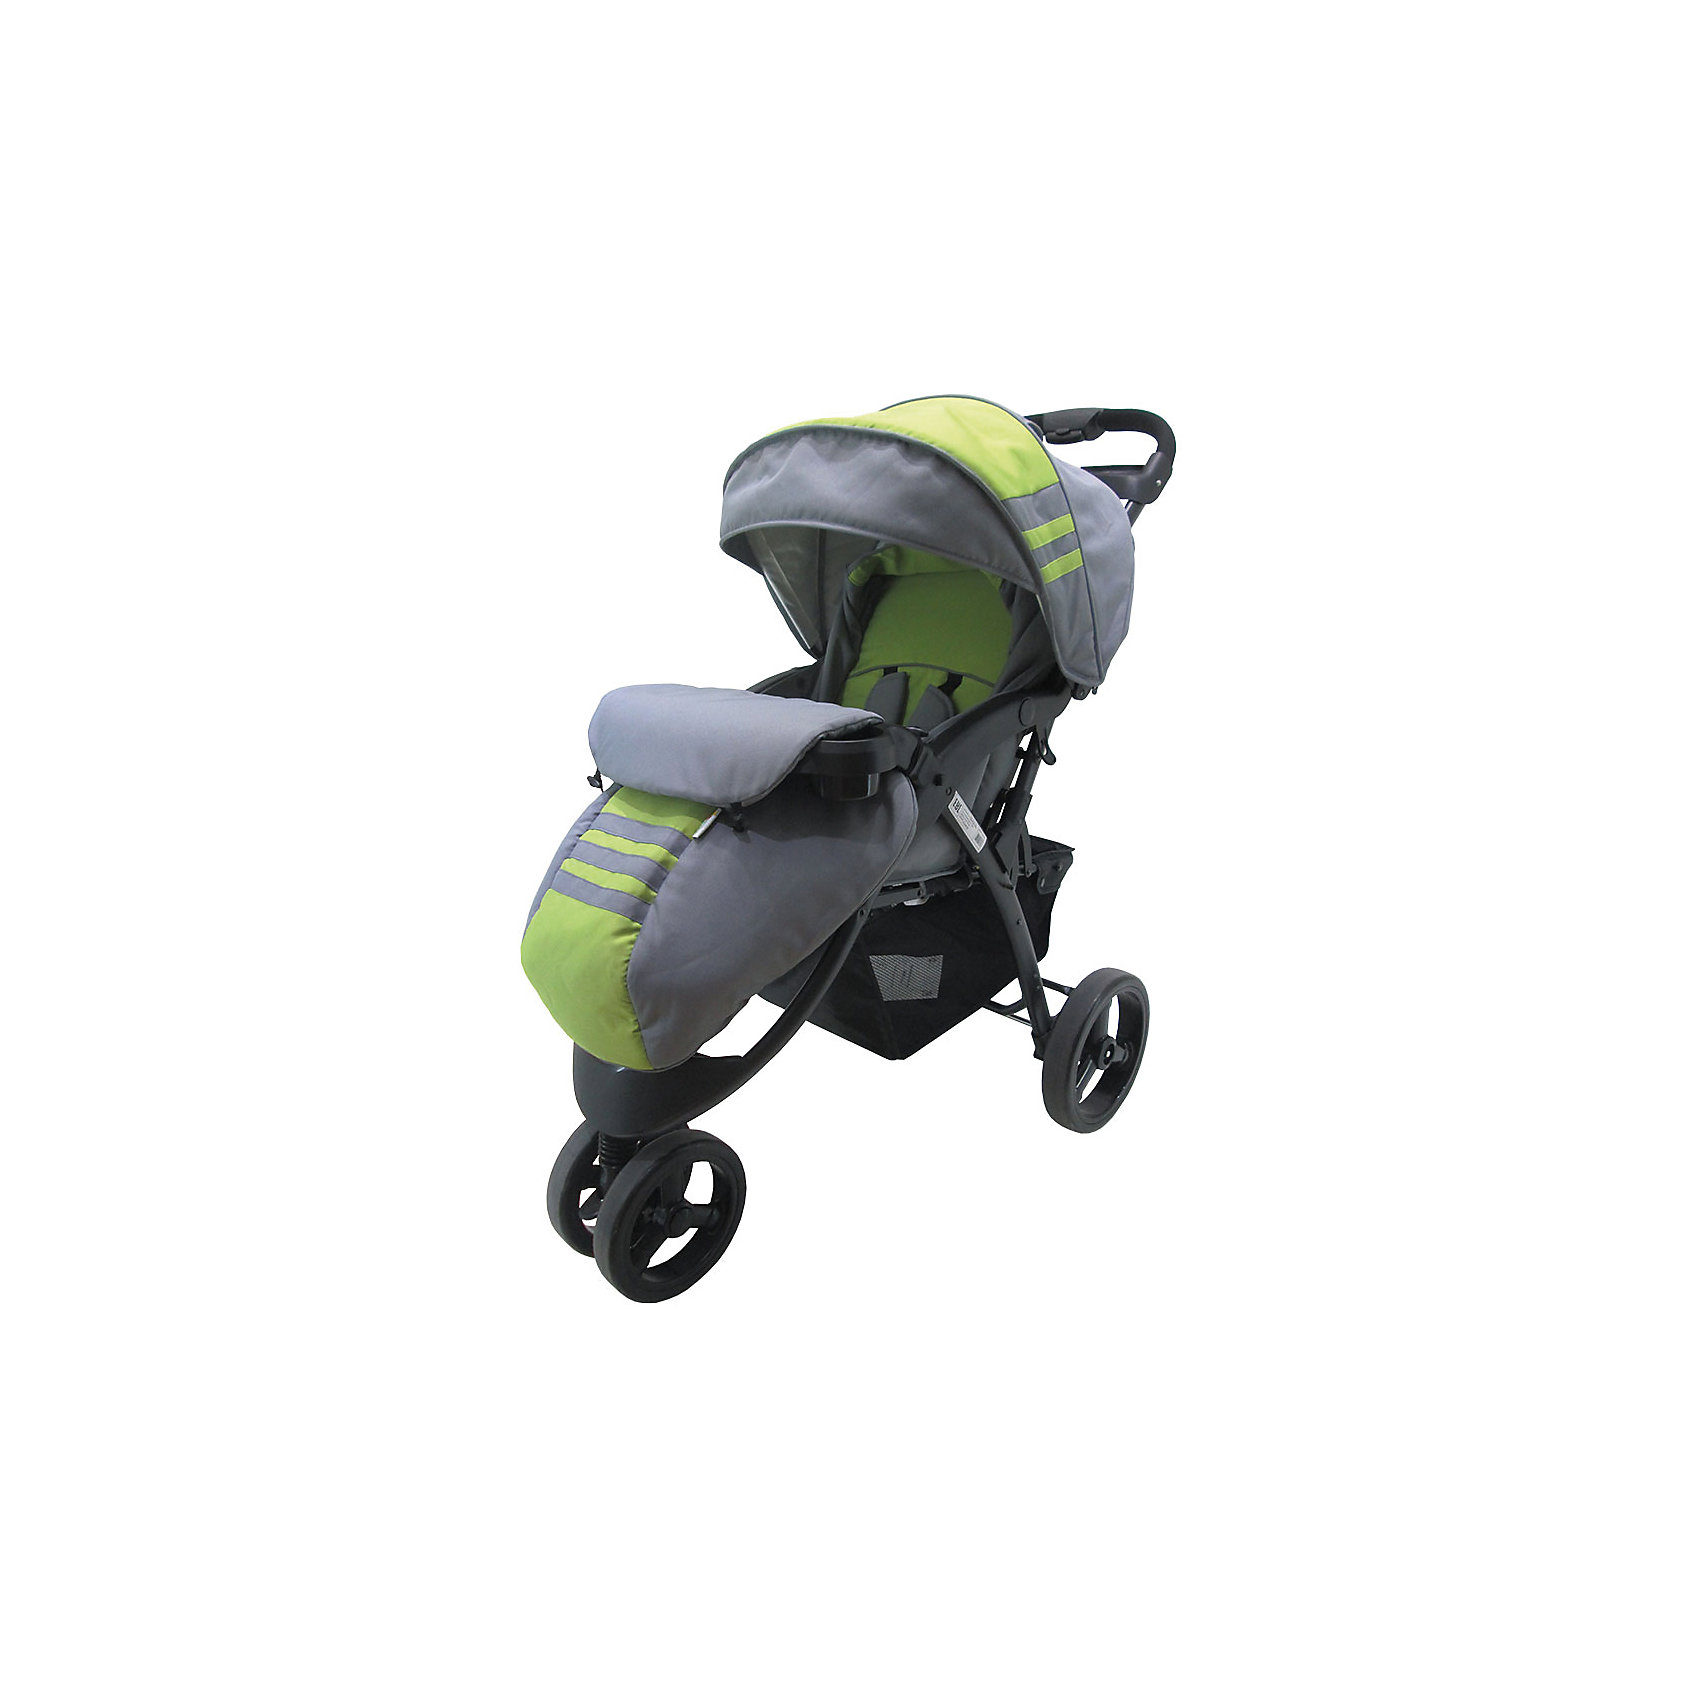 Baby Hit Прогулочная коляска Voyage, Baby Hit, серый/зелёный прогулочная коляска cool baby kdd 6688gb a lilac dairy